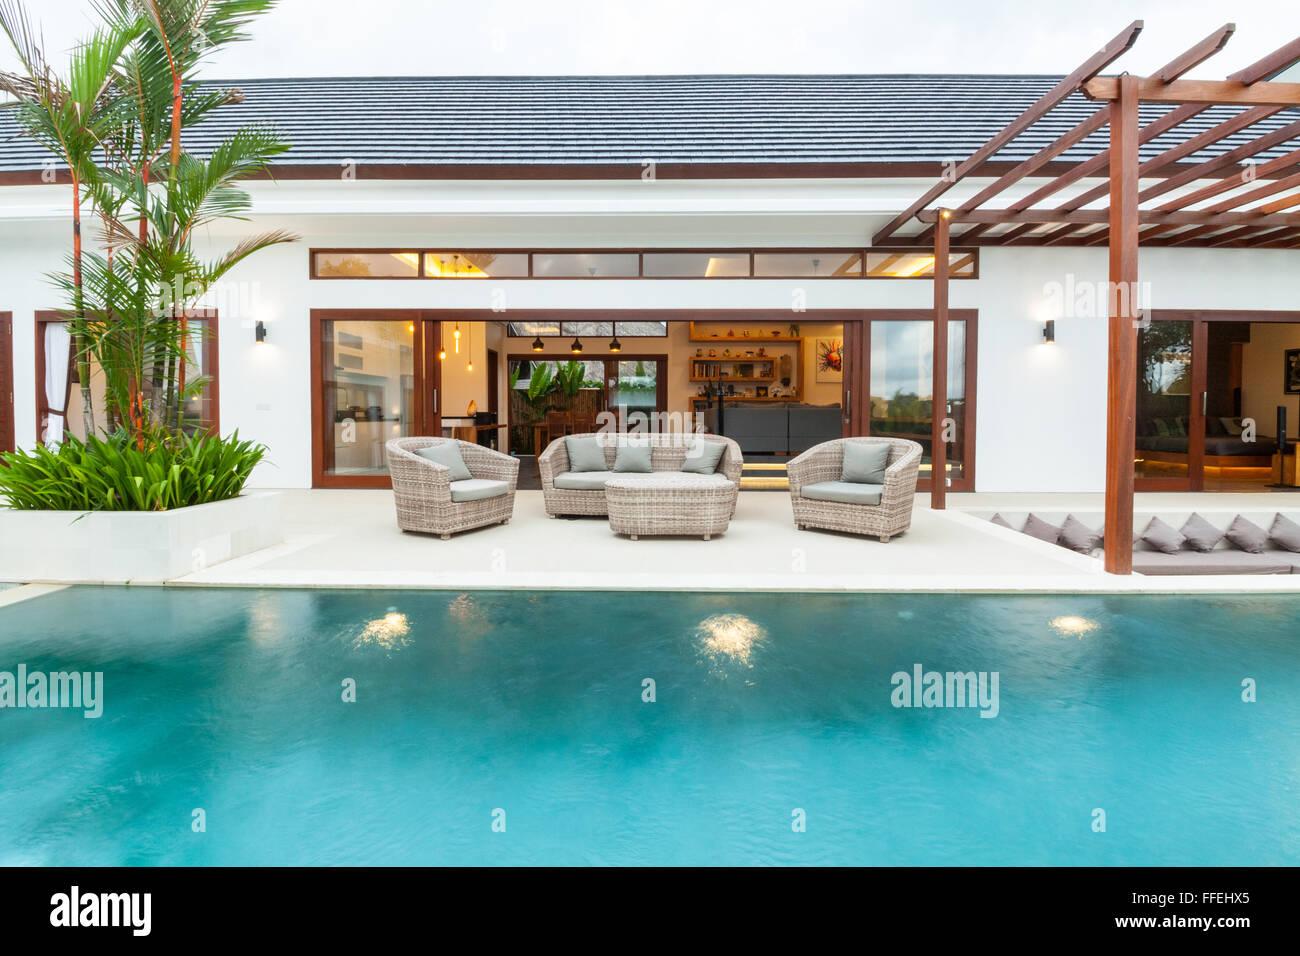 Swimming Pool Villa View To Living Room Stock Photo Alamy